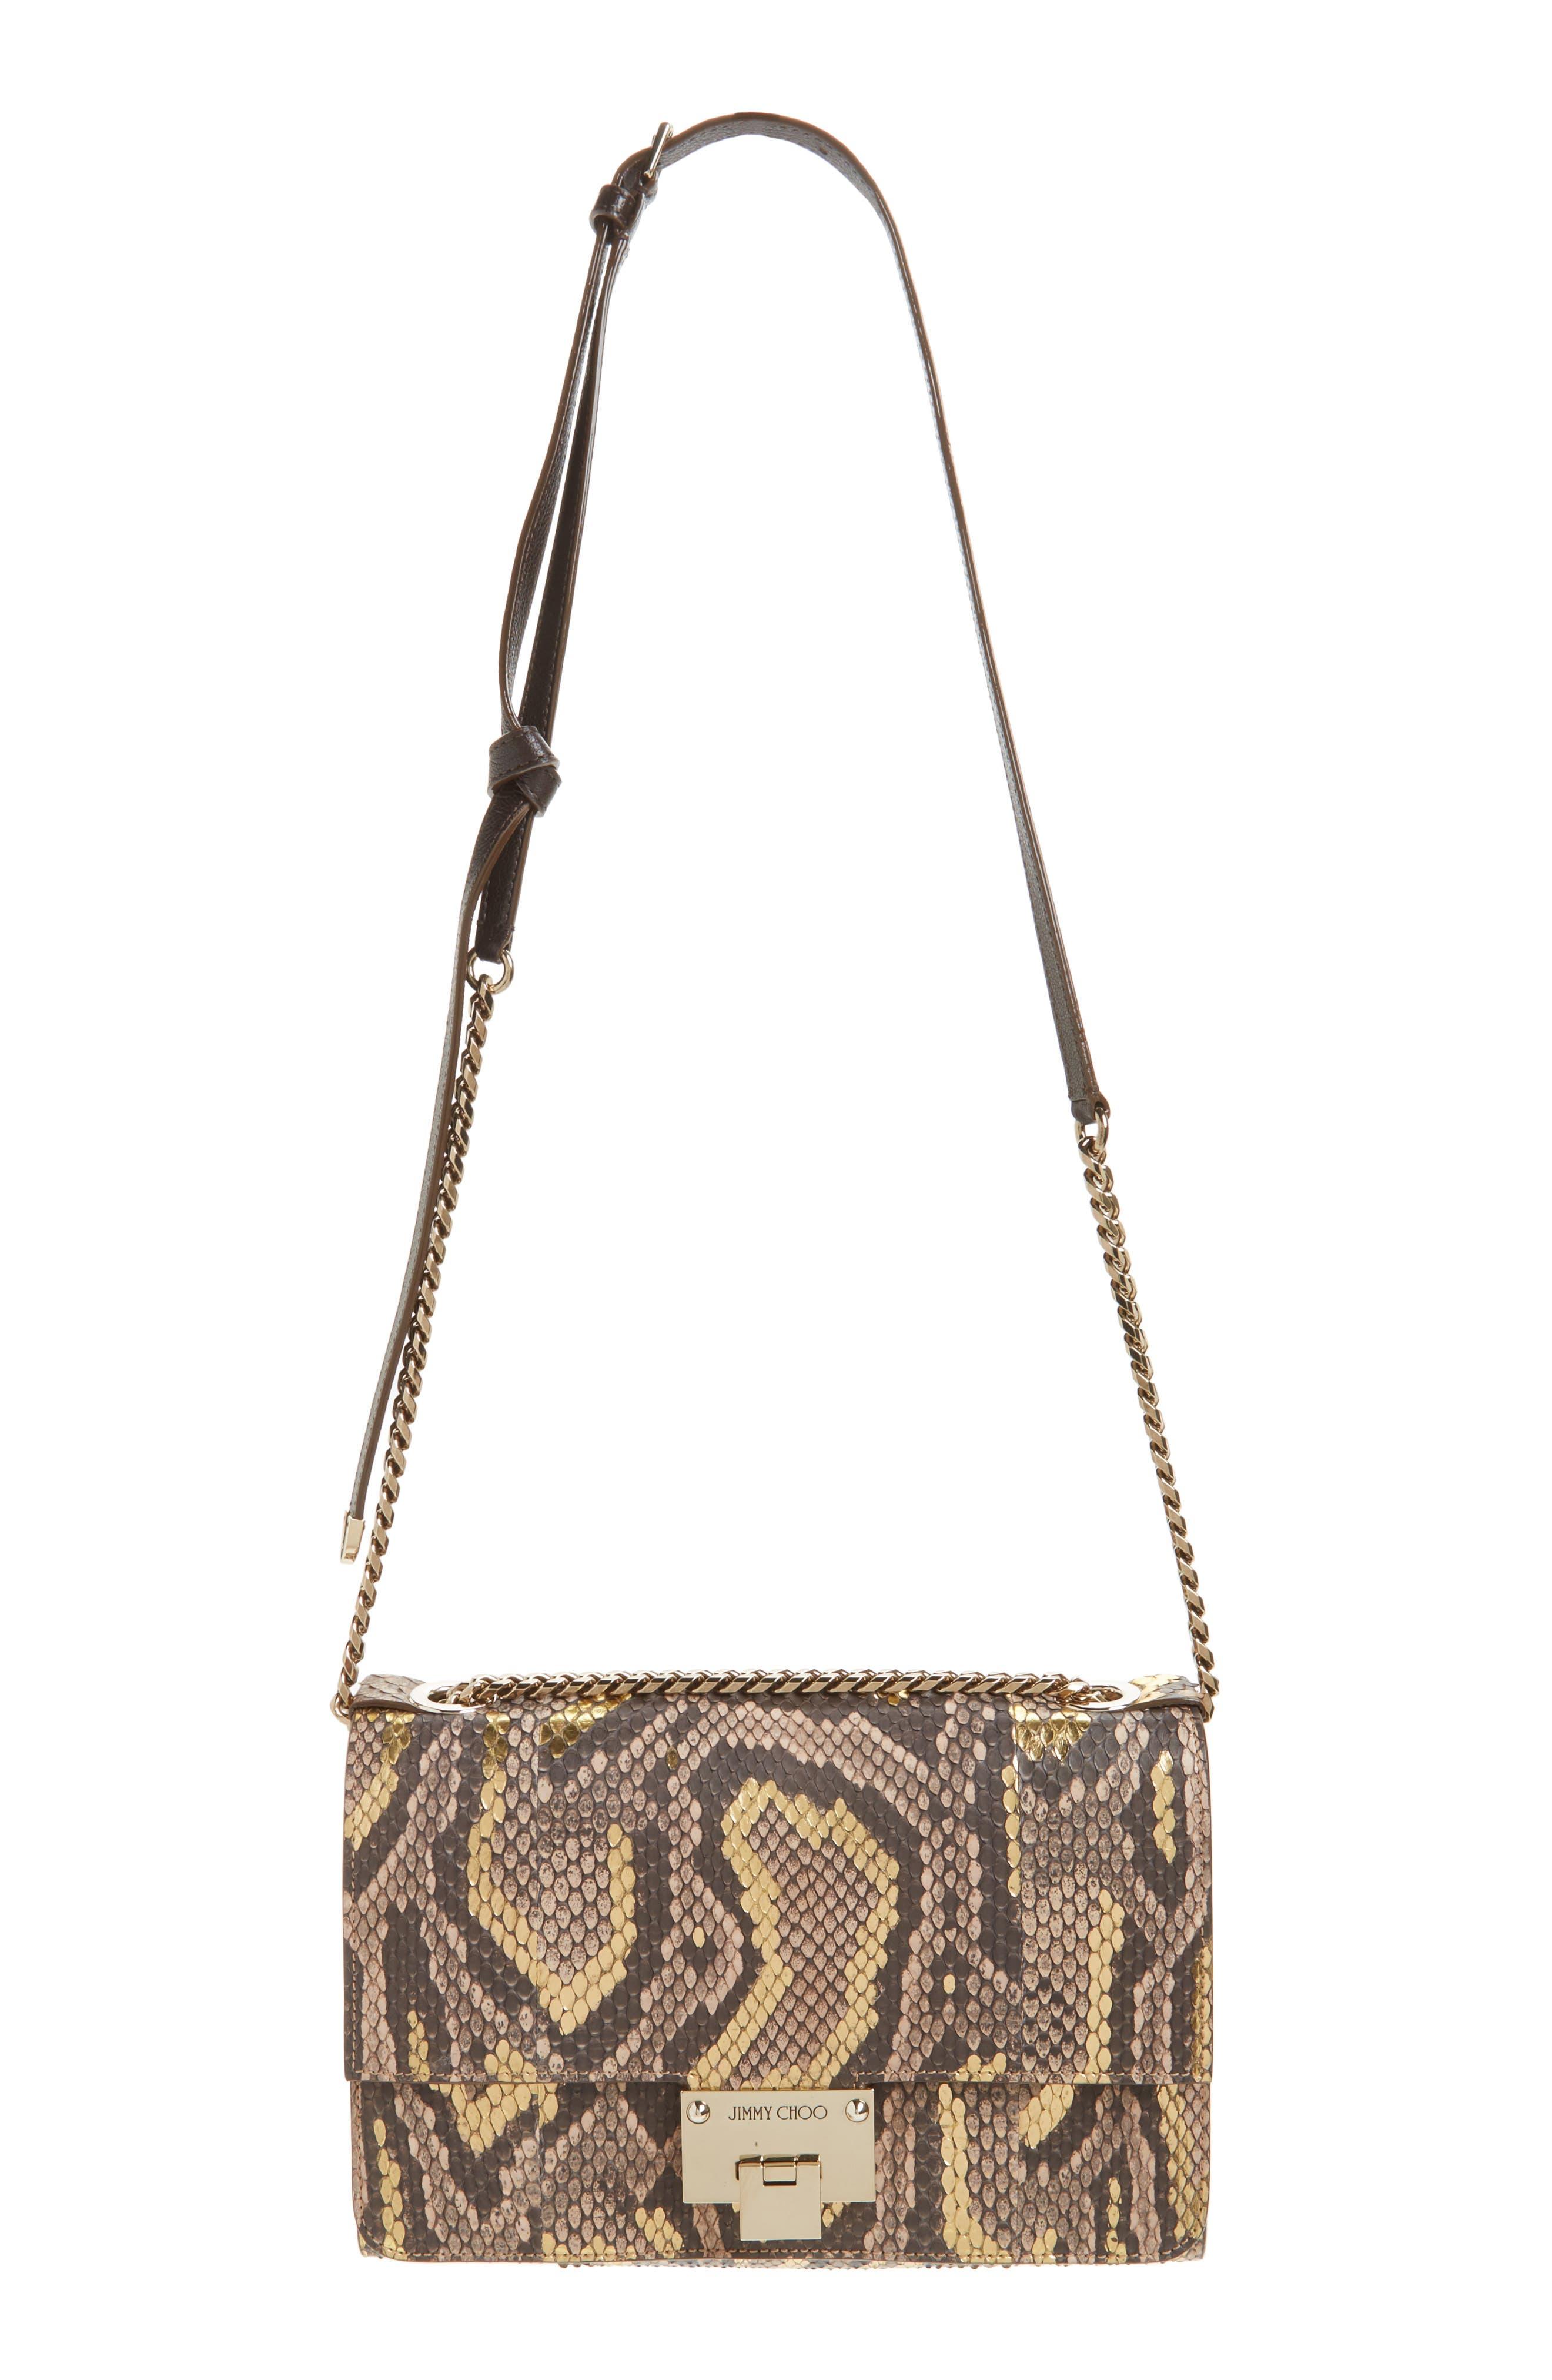 Alternate Image 1 Selected - Jimmy Choo Rebel Genuine Python Crossbody Bag